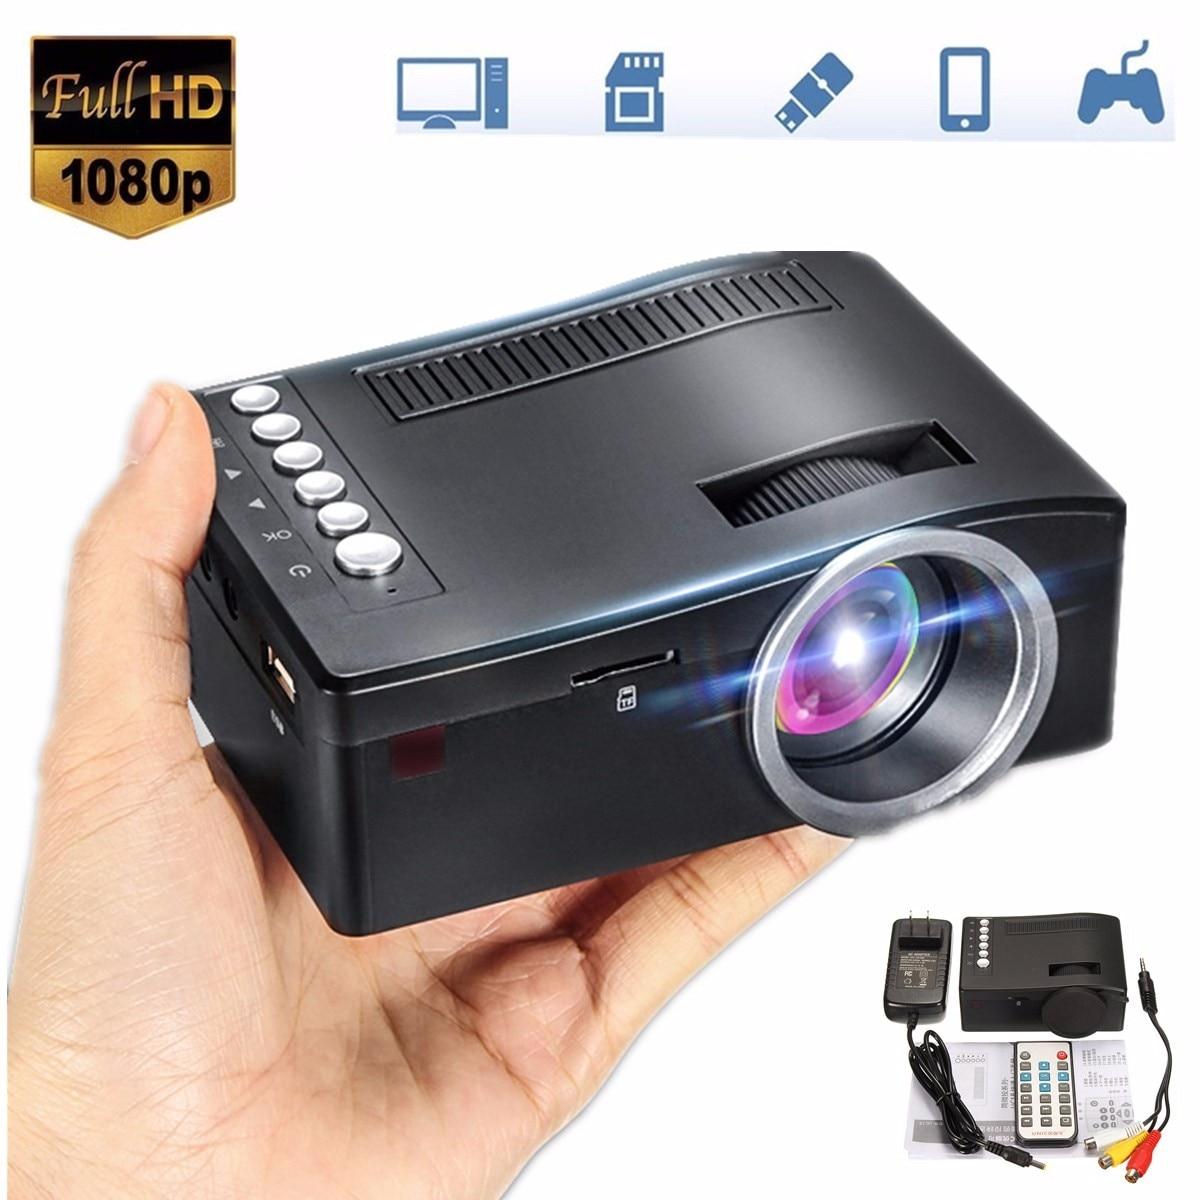 Mini cinéma Home cinéma système 1080P HD multimédia projecteur TV AV USB TF HDMI PC LED numérique poche maison projecteur maison maison